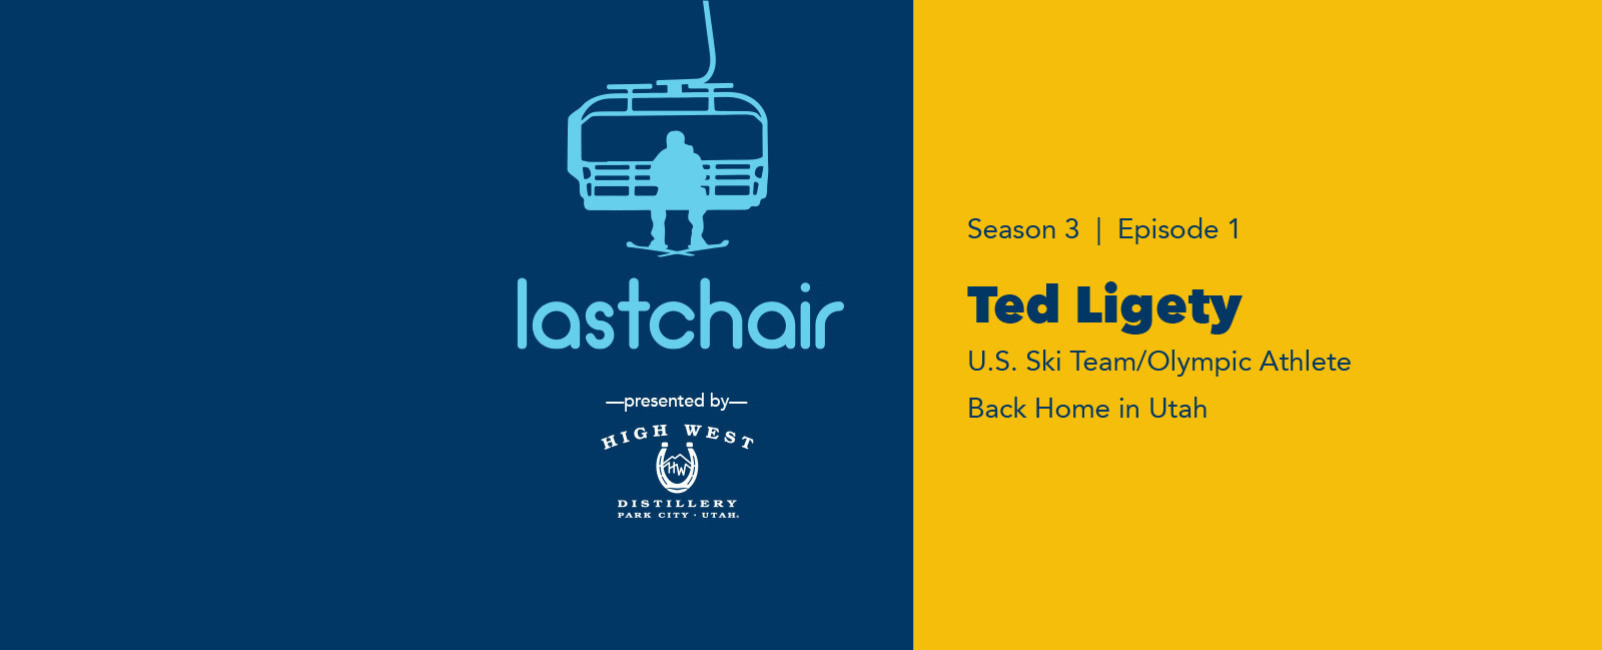 Ted Ligety: Back Home in Utah